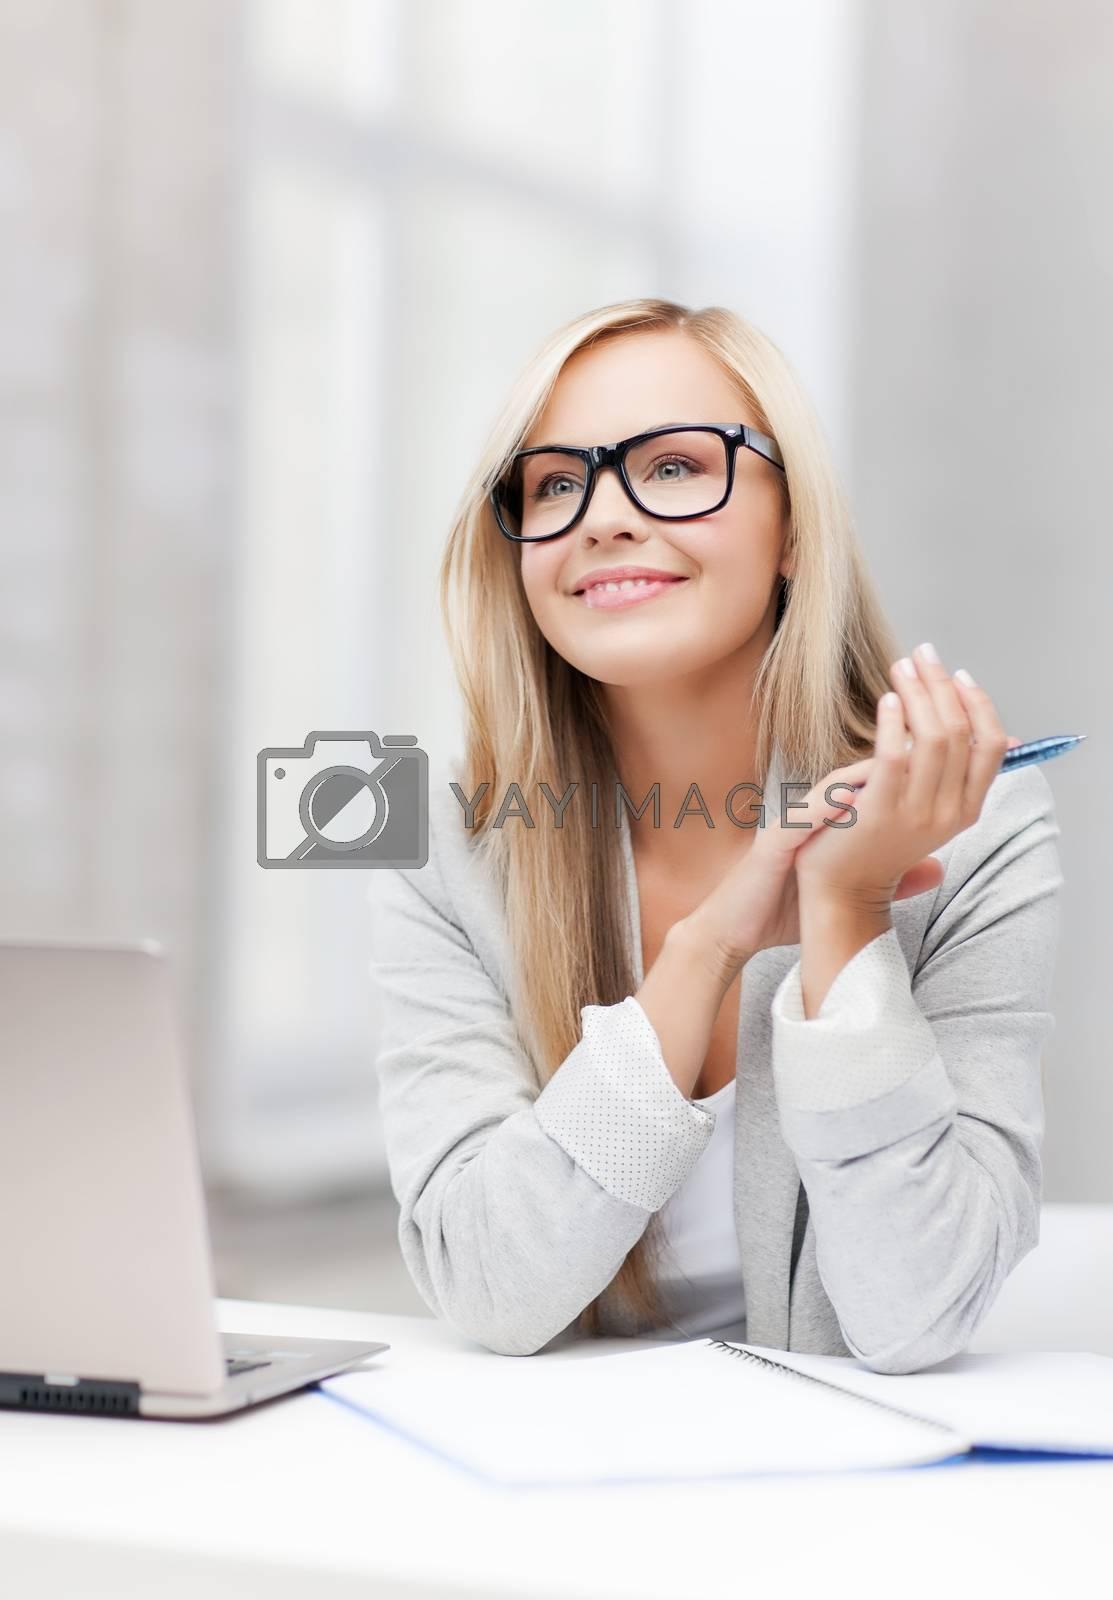 businesswoman on a meeting by dolgachov